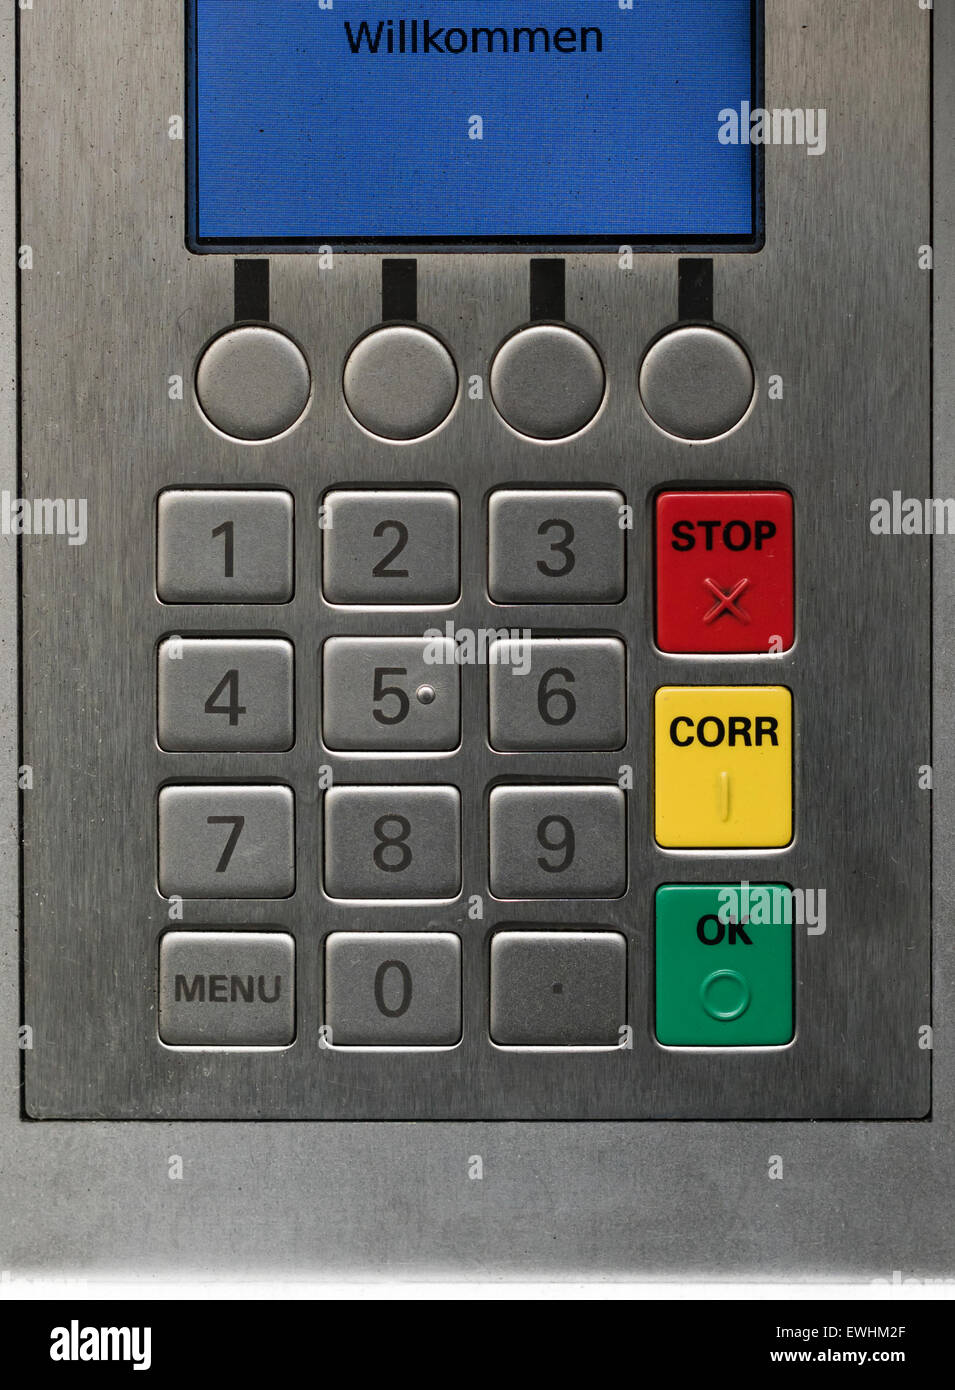 vending machine troubleshooting